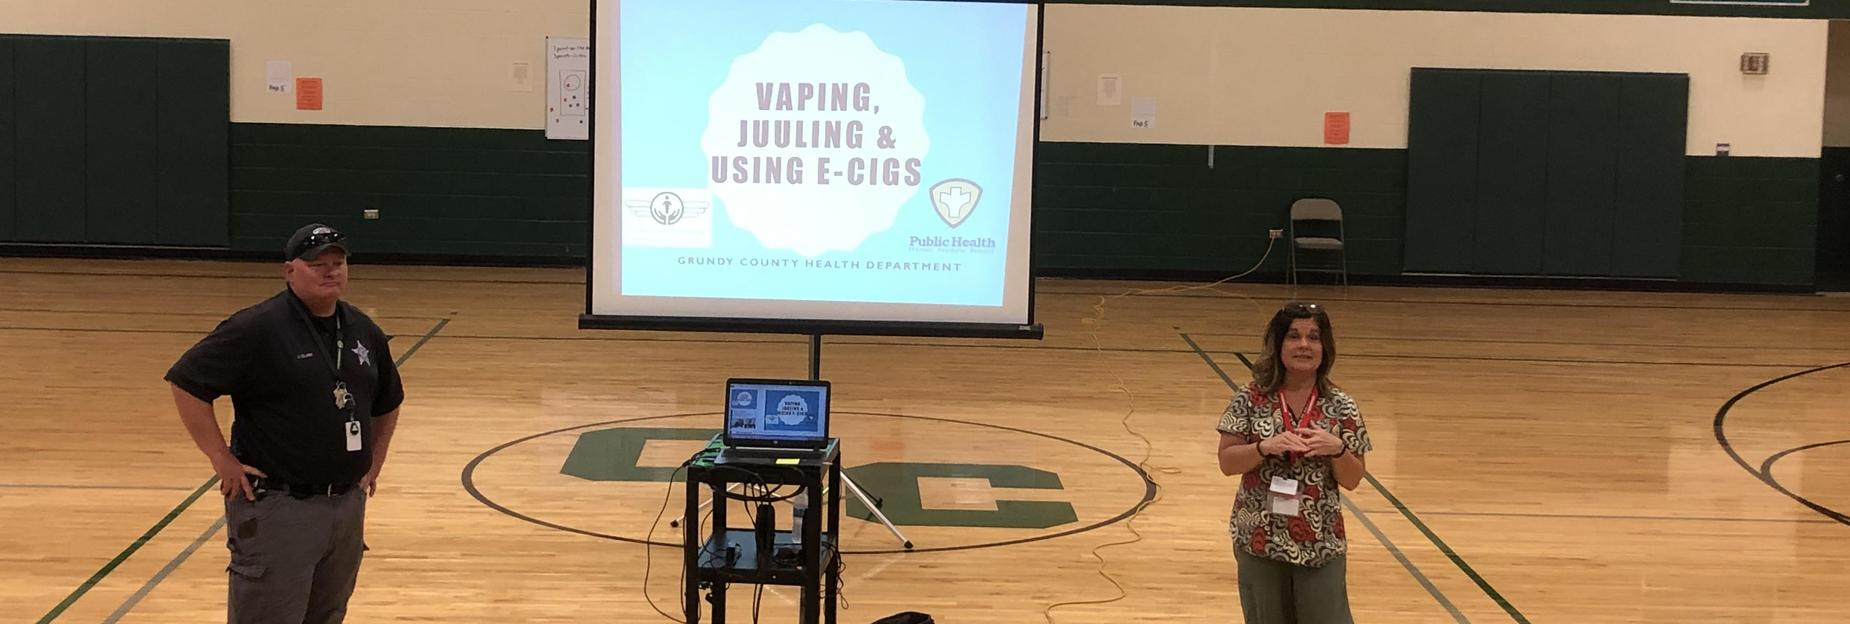 Vaping Presentation